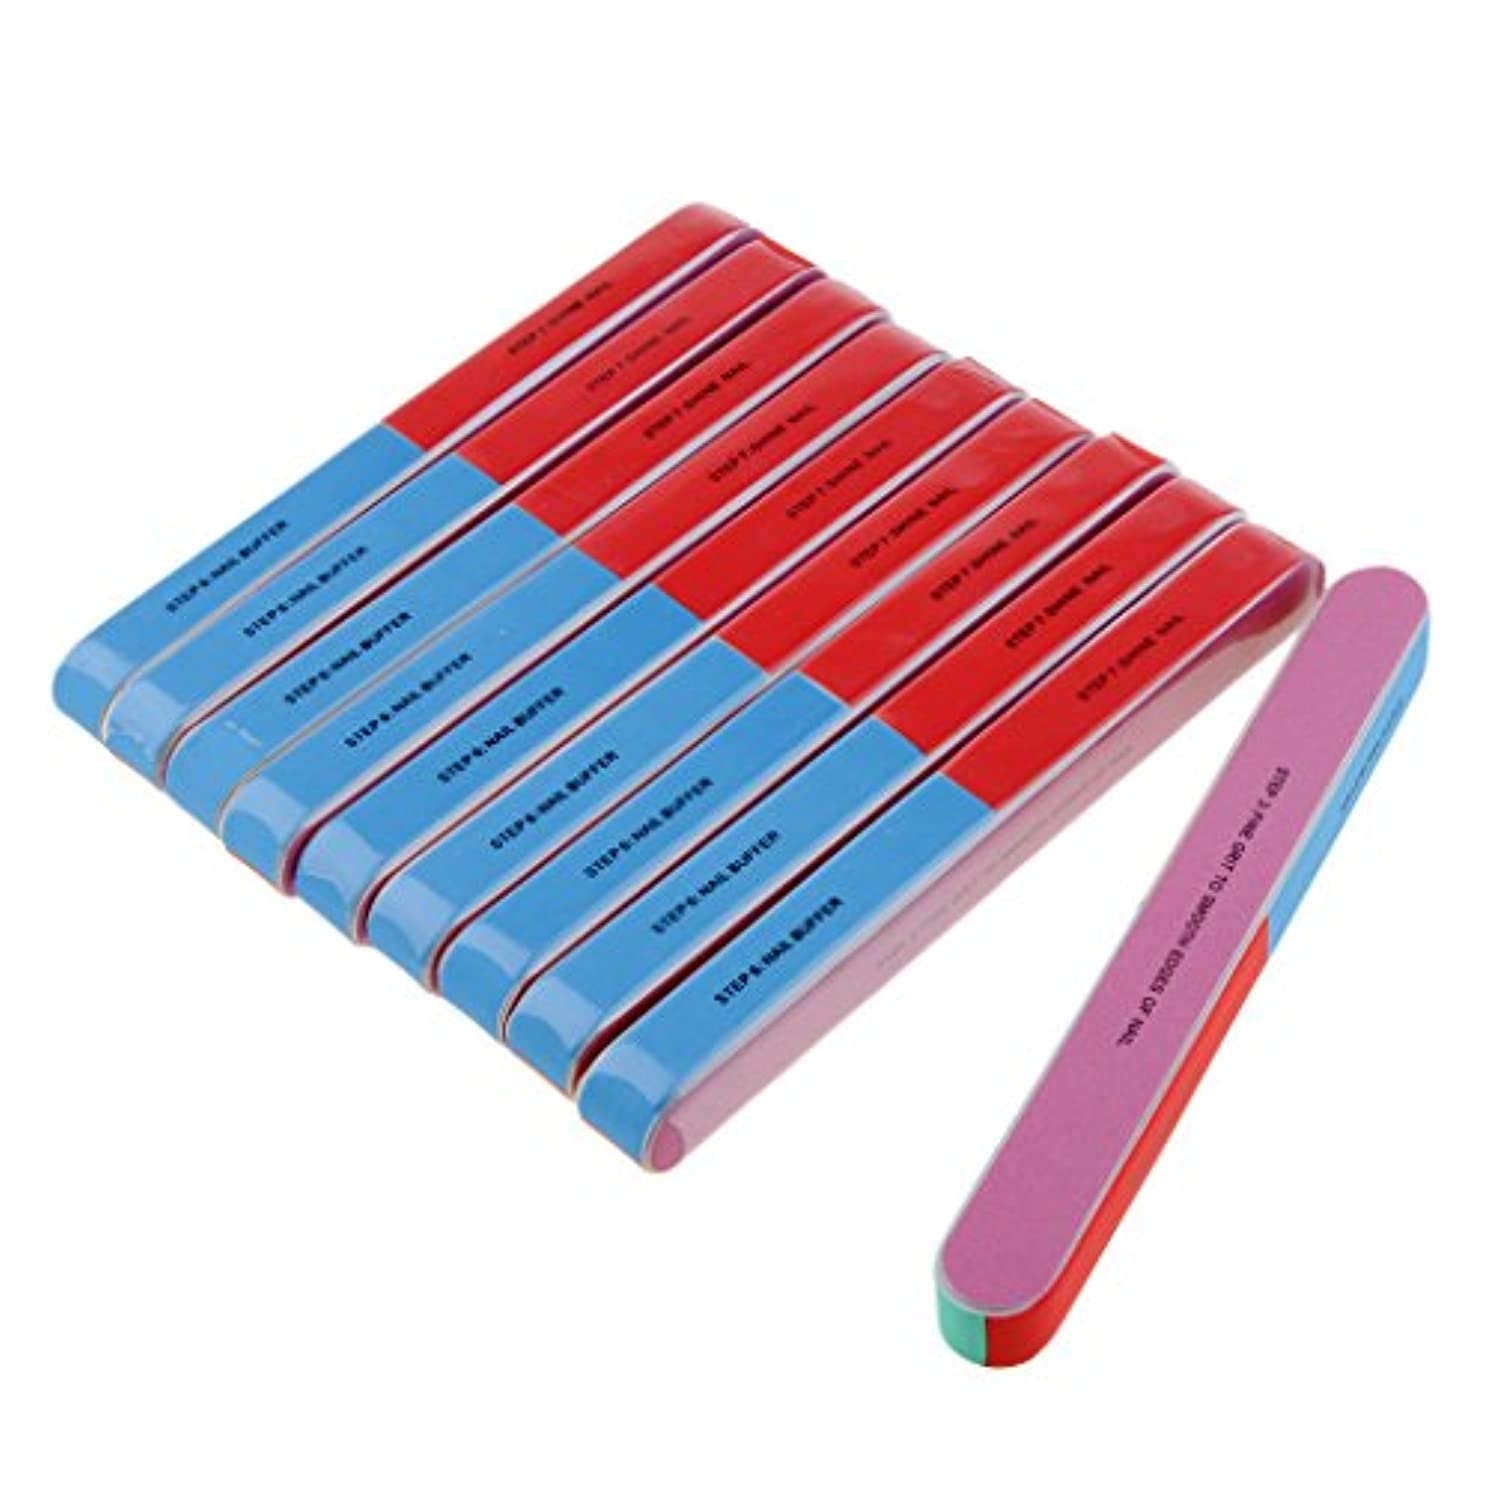 Baosity ネイルファイル ネイルケア 爪やすり スポンジ ネイルサロン 自宅用 プロ 爪磨き 10本